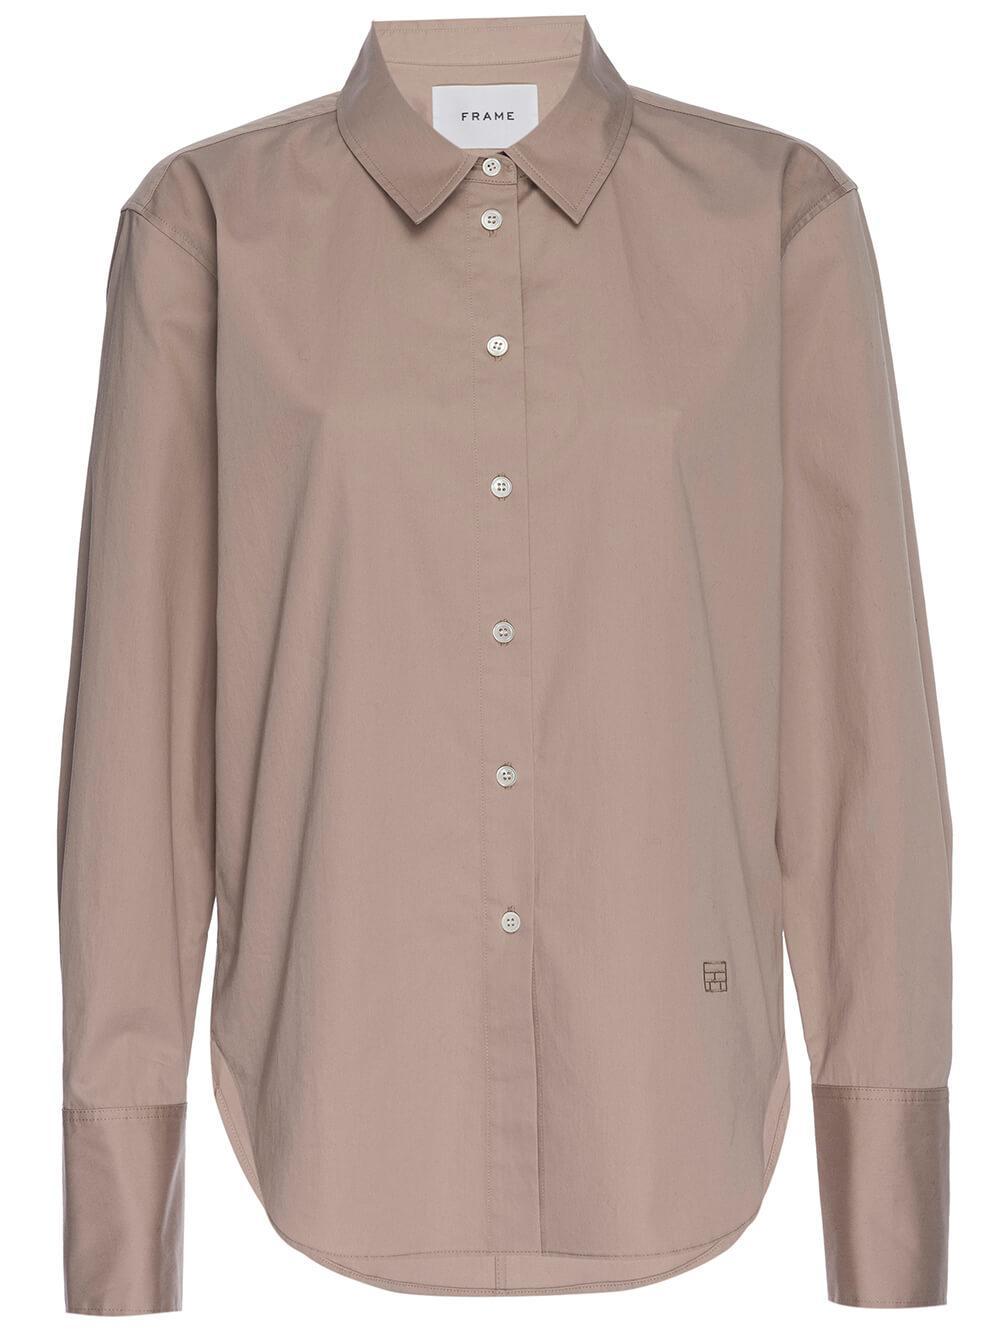 The Standard Shirt Item # LWSH2322